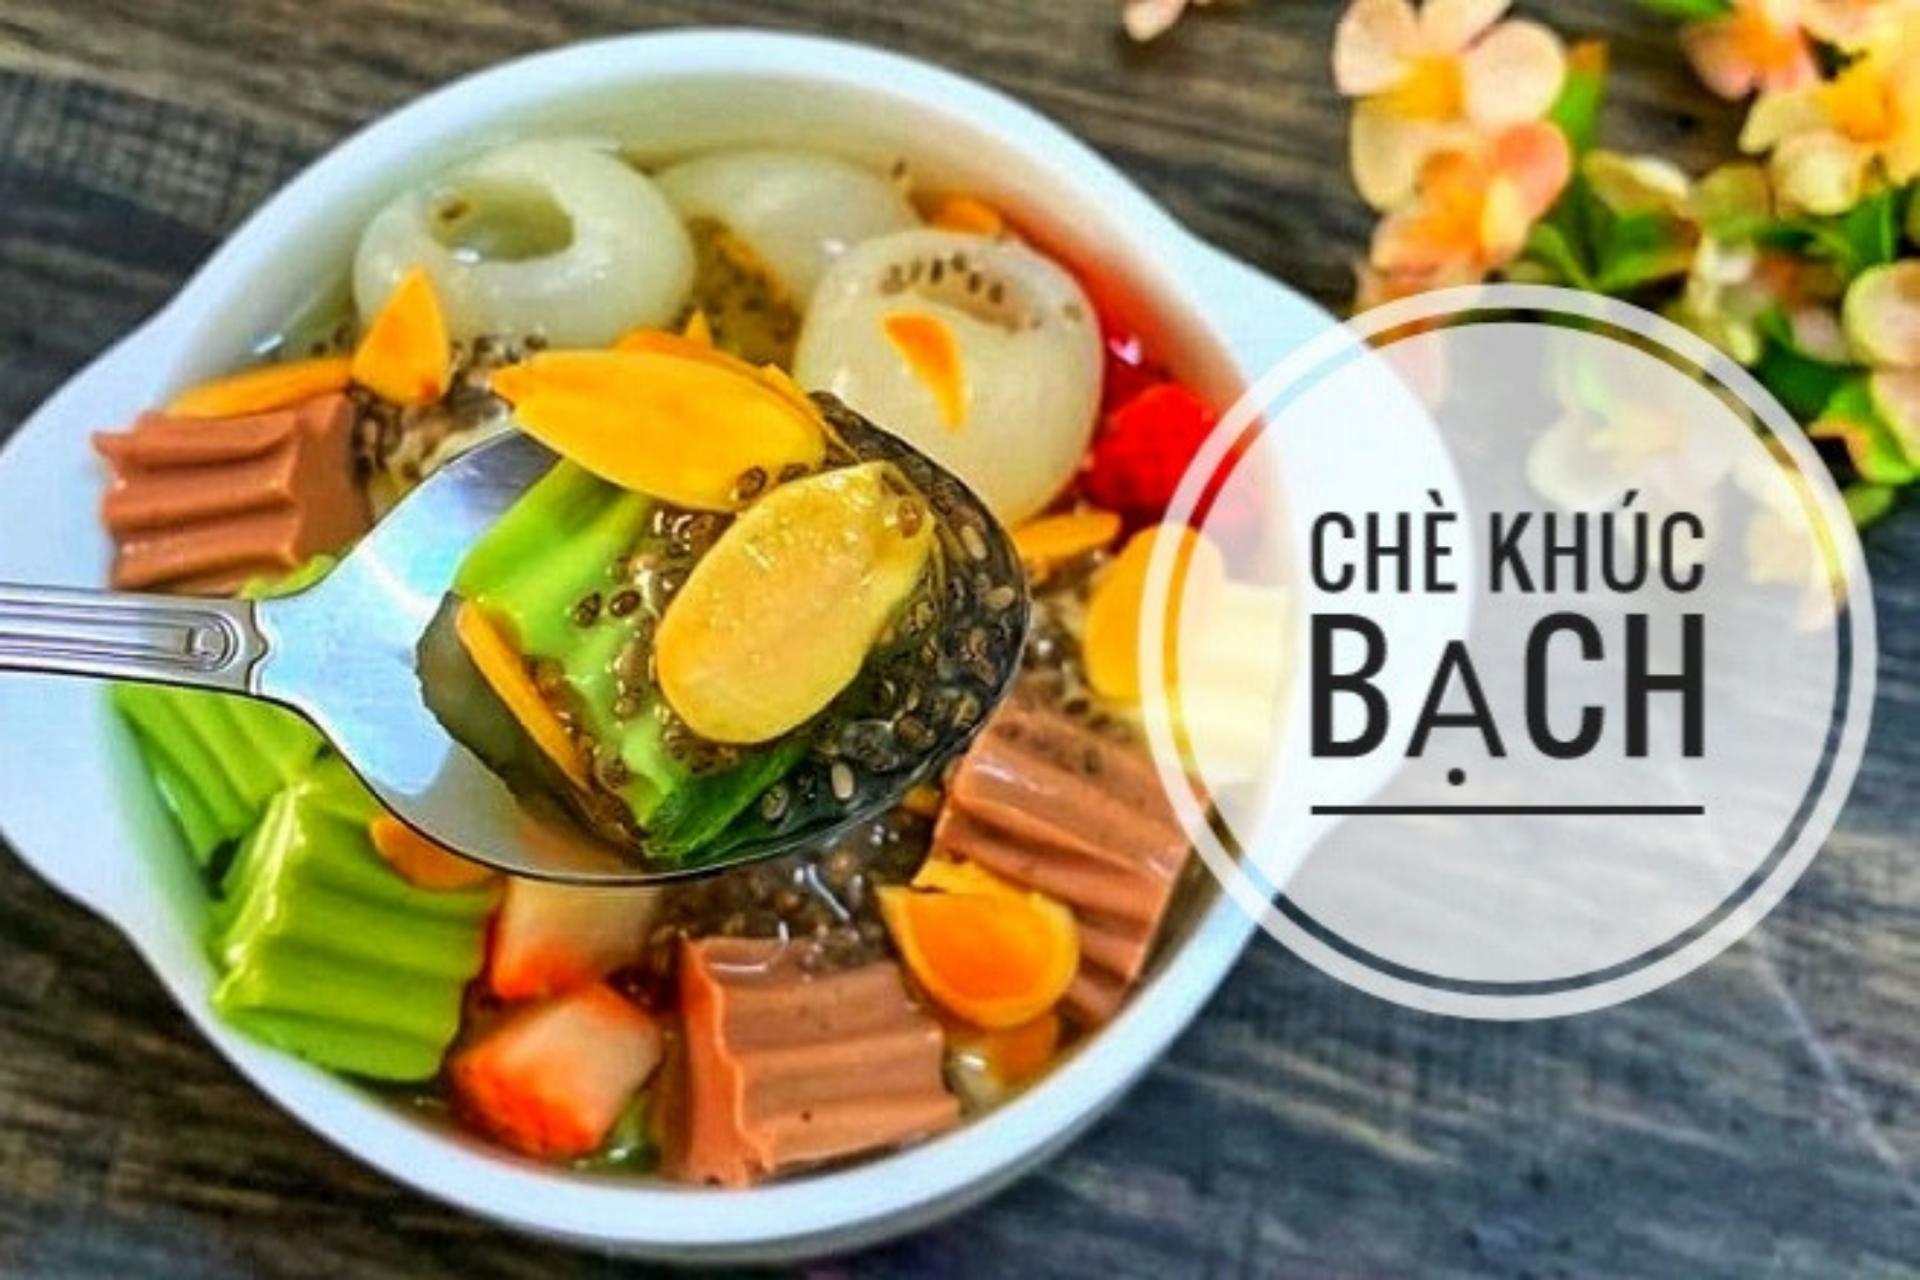 Recipe: Vietnamese Milk Cheese Jelly Sweet Soup Dessert (Chè Khúc Bạch)